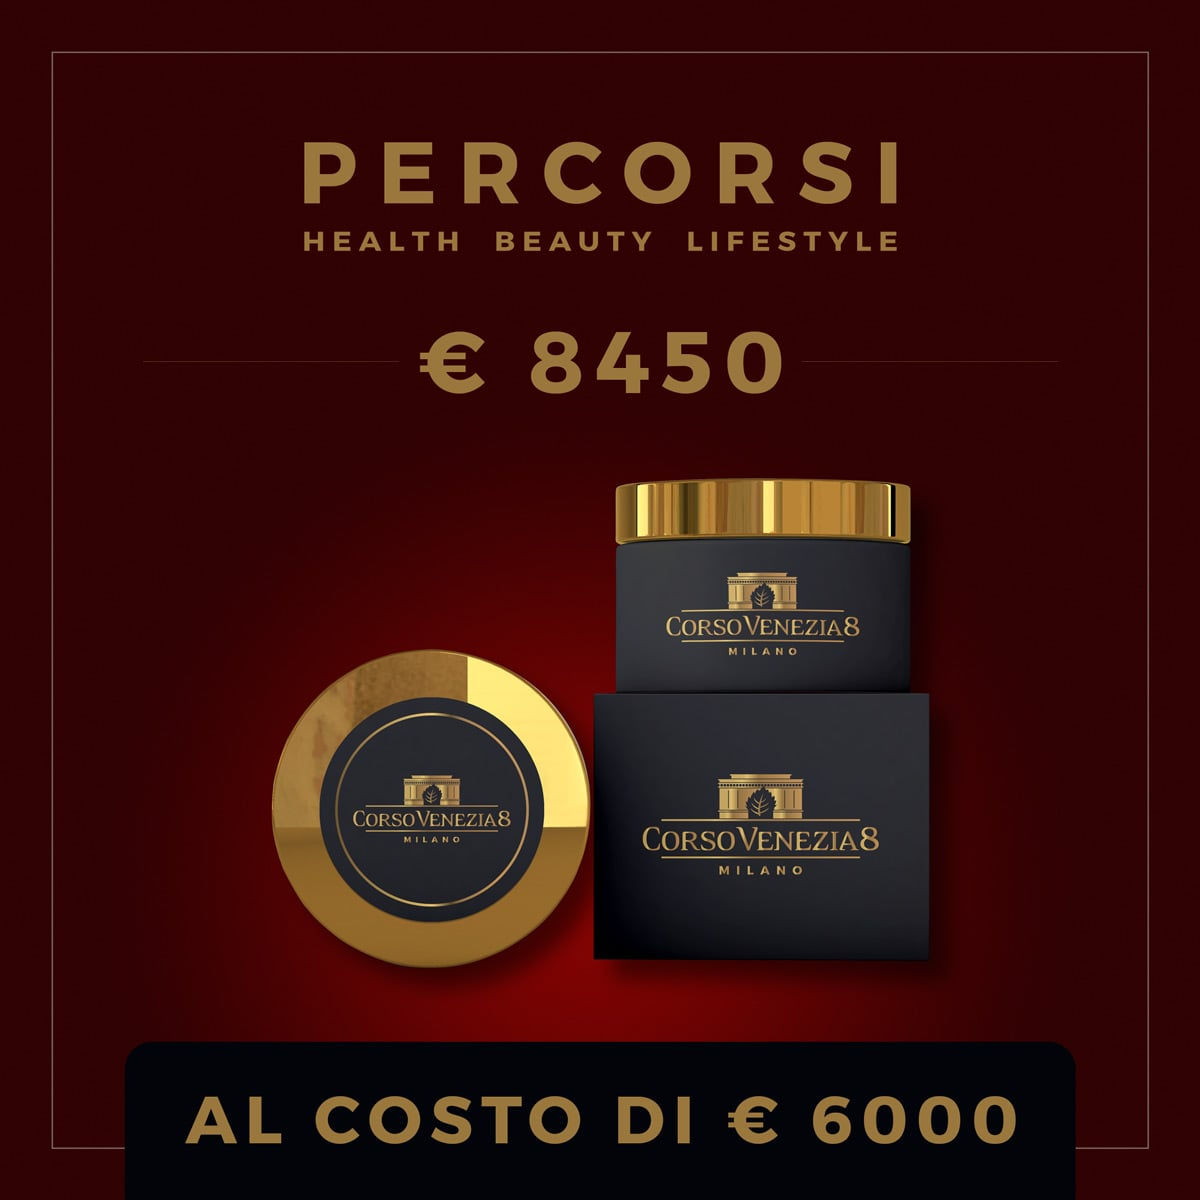 Percorsi Estetici - Voucher € 8450